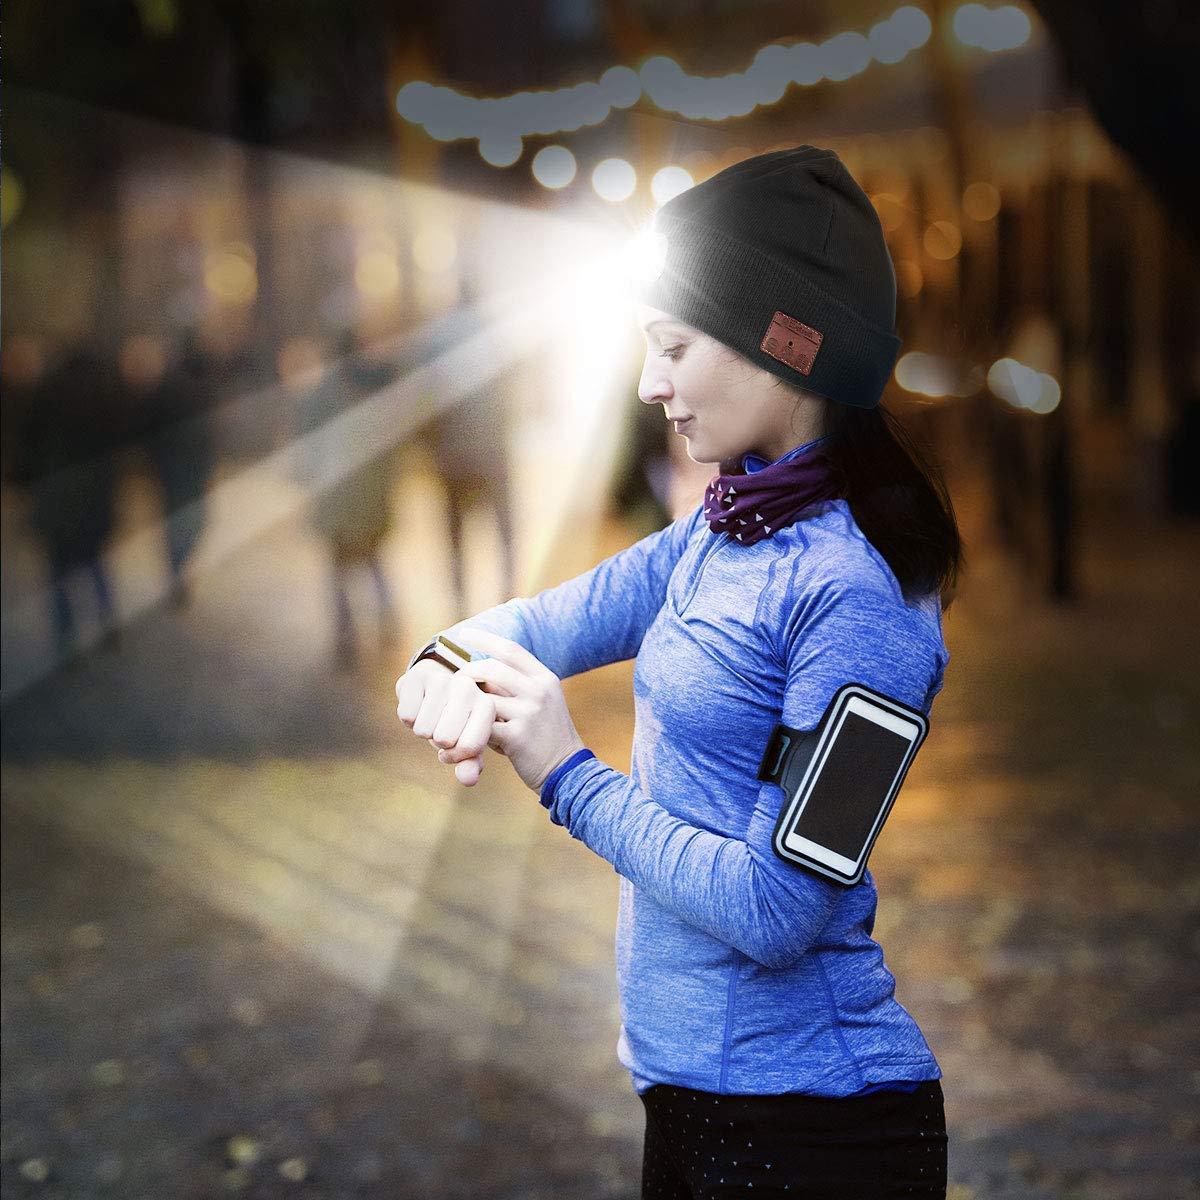 SSCJ Gorra inalámbrica Carga Bluetooth Beanie con Linterna LED Carga inalámbrica USB Gorra de música Unisex Correr Esquí Senderismo Camping Ciclismo/Recibir Llamadas/Escuchar música,Negro 3ff4ef